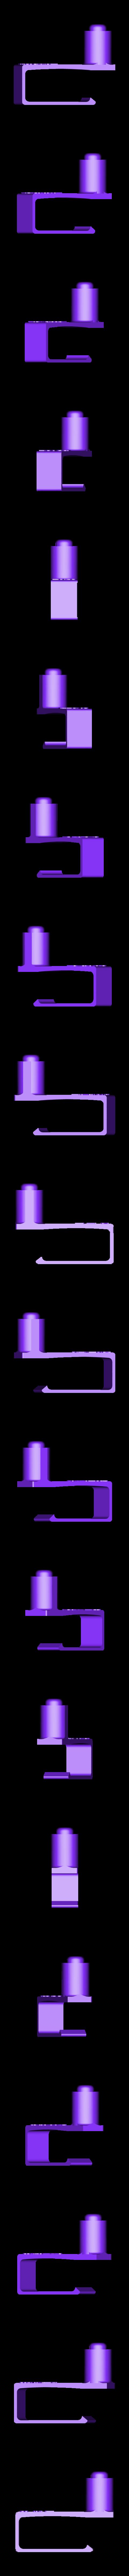 Clip_on_folding_chair_mount.stl Download free STL file Self-righting Gimballed drinks holder • 3D printer model, 3D-Designs